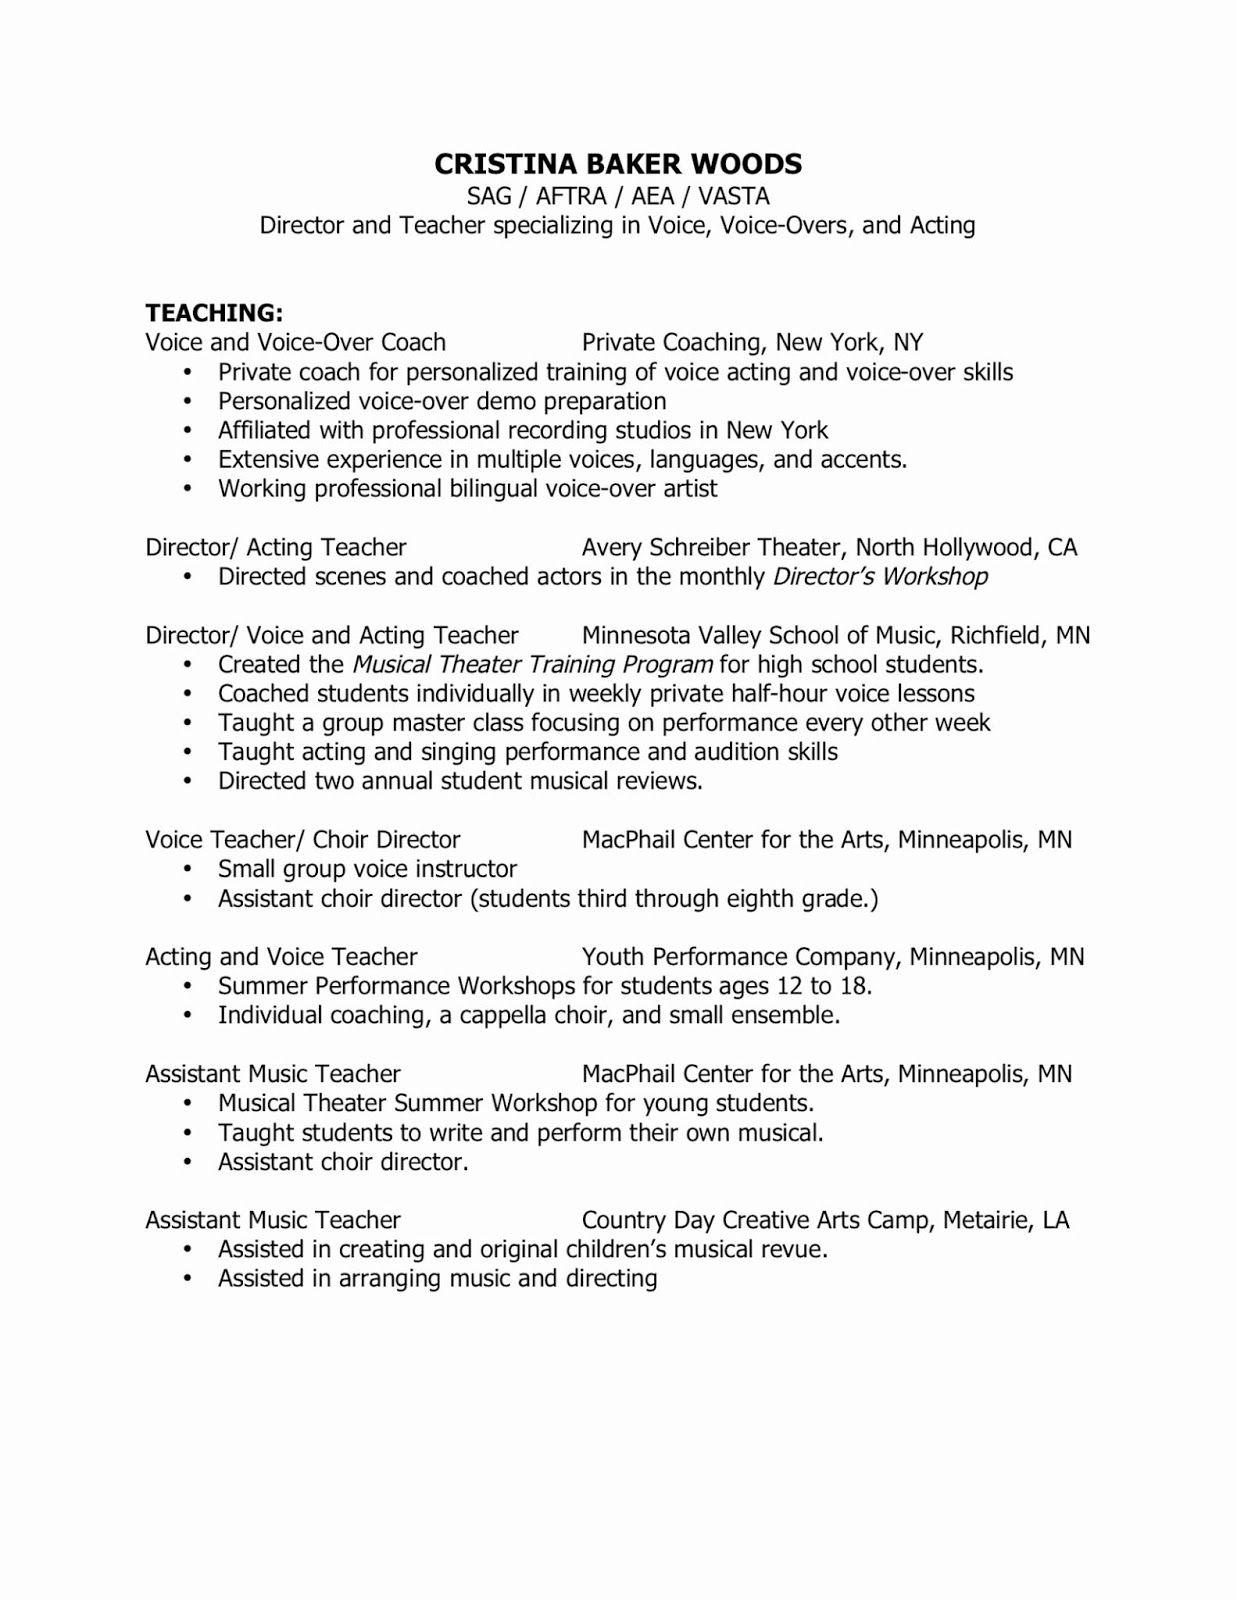 Basketball Player Resume 2019 Professional Basketball Player Resume Templates 2020 Basketball Player Re Teacher Assistant Jobs Assistant Jobs Teacher Aide Jobs